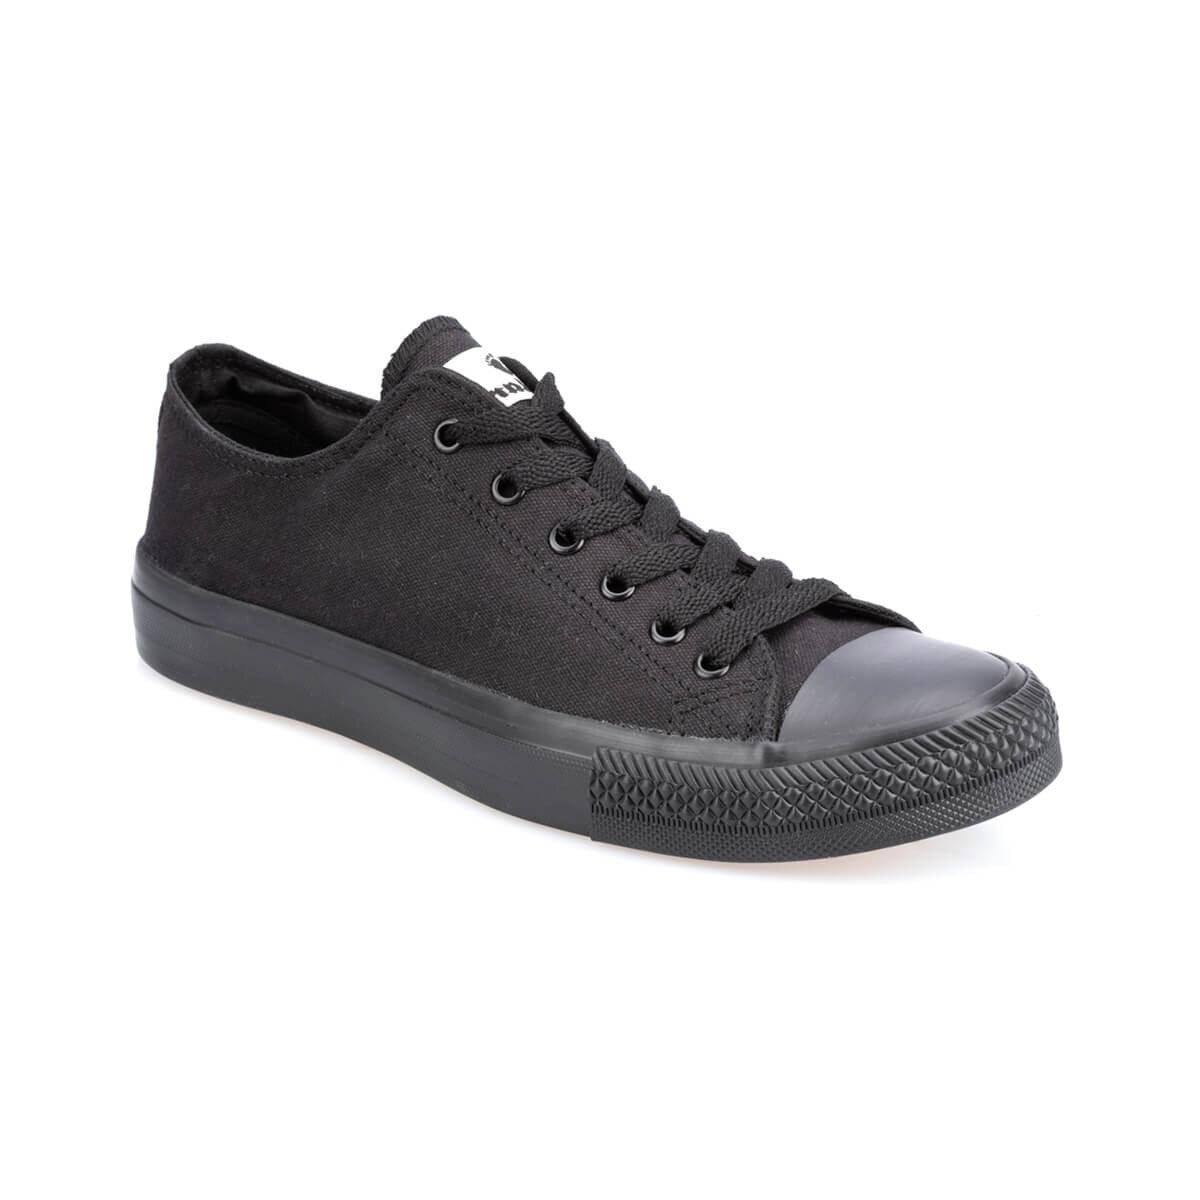 FLO 91. 355075.M Black Men 'S Sneaker Shoes Polaris